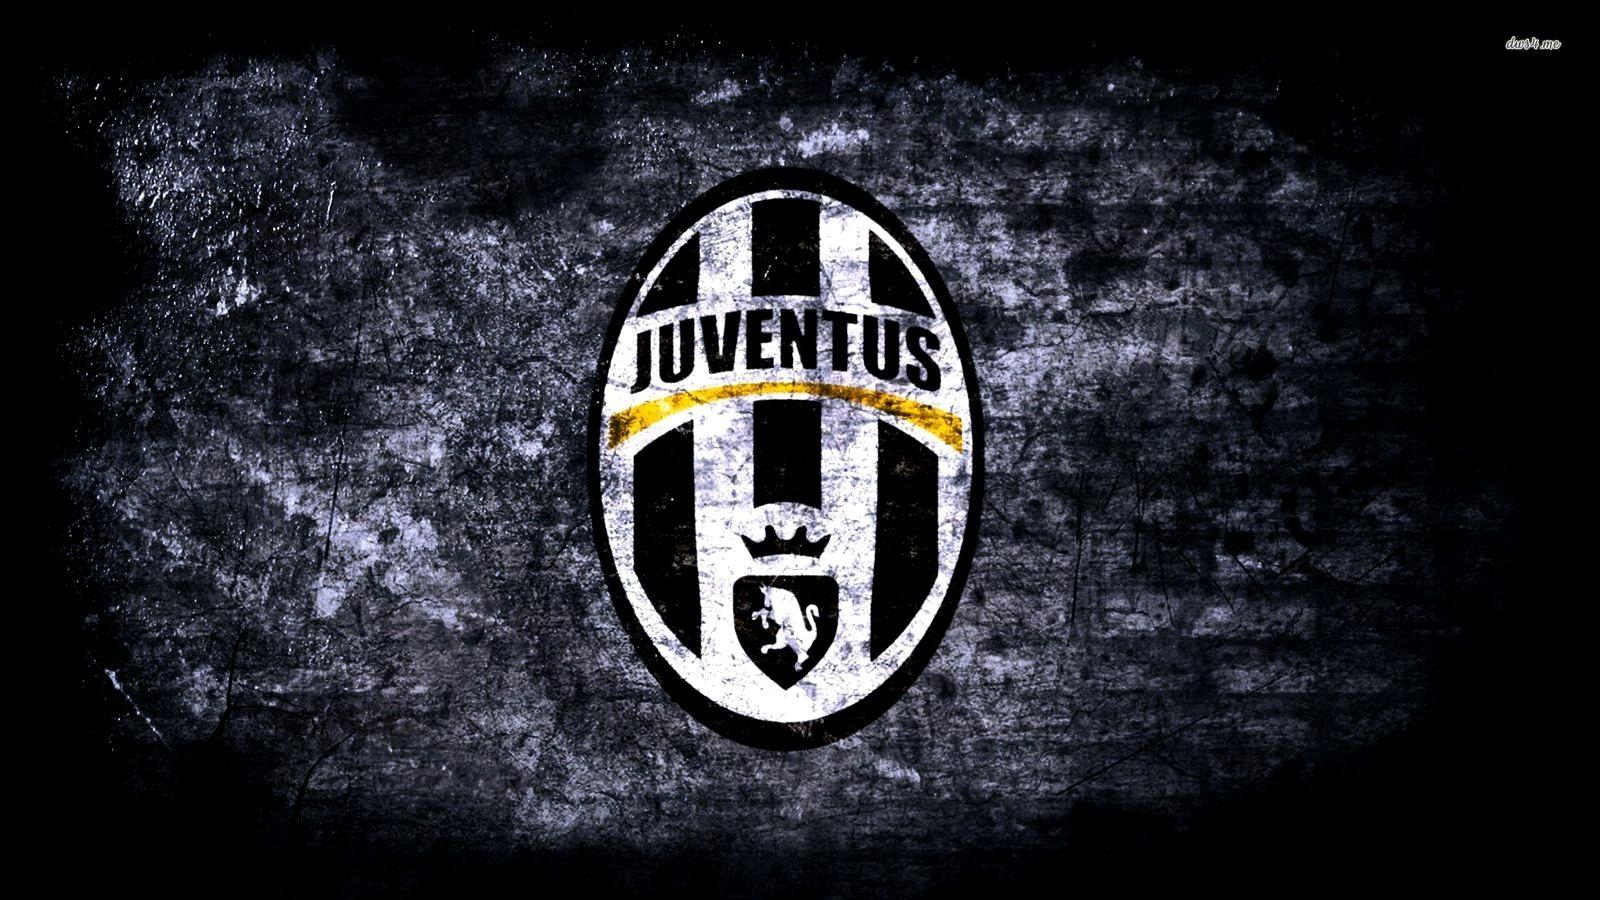 Wallpaper 4k Juventus Ideas Juventus Gambar Cristiano Ronaldo